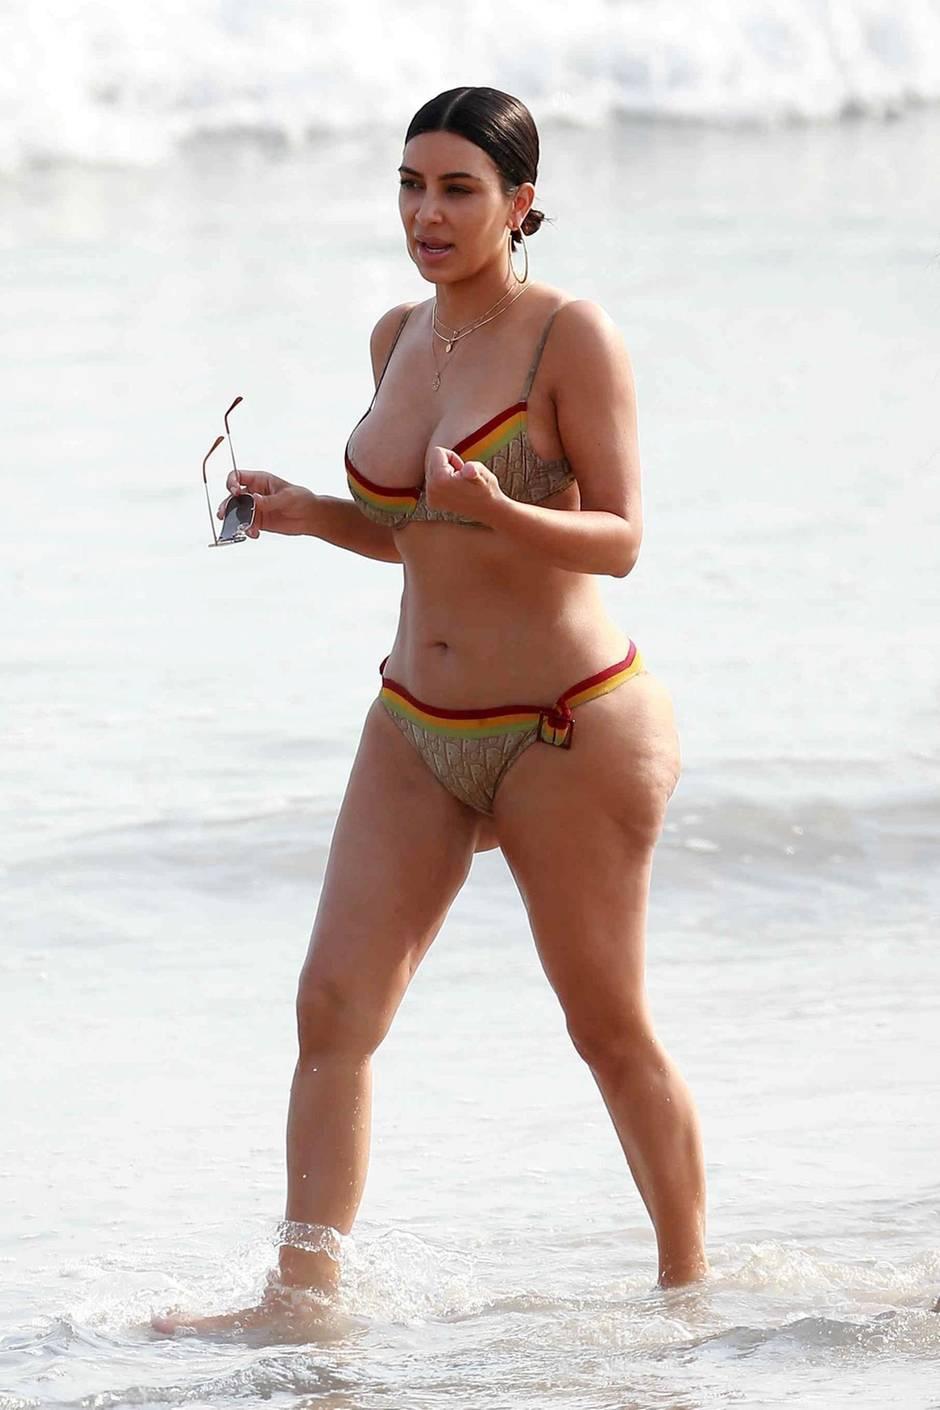 Kim Kardashian Im Bikini - Berraschung Sie Ist Eine -7927